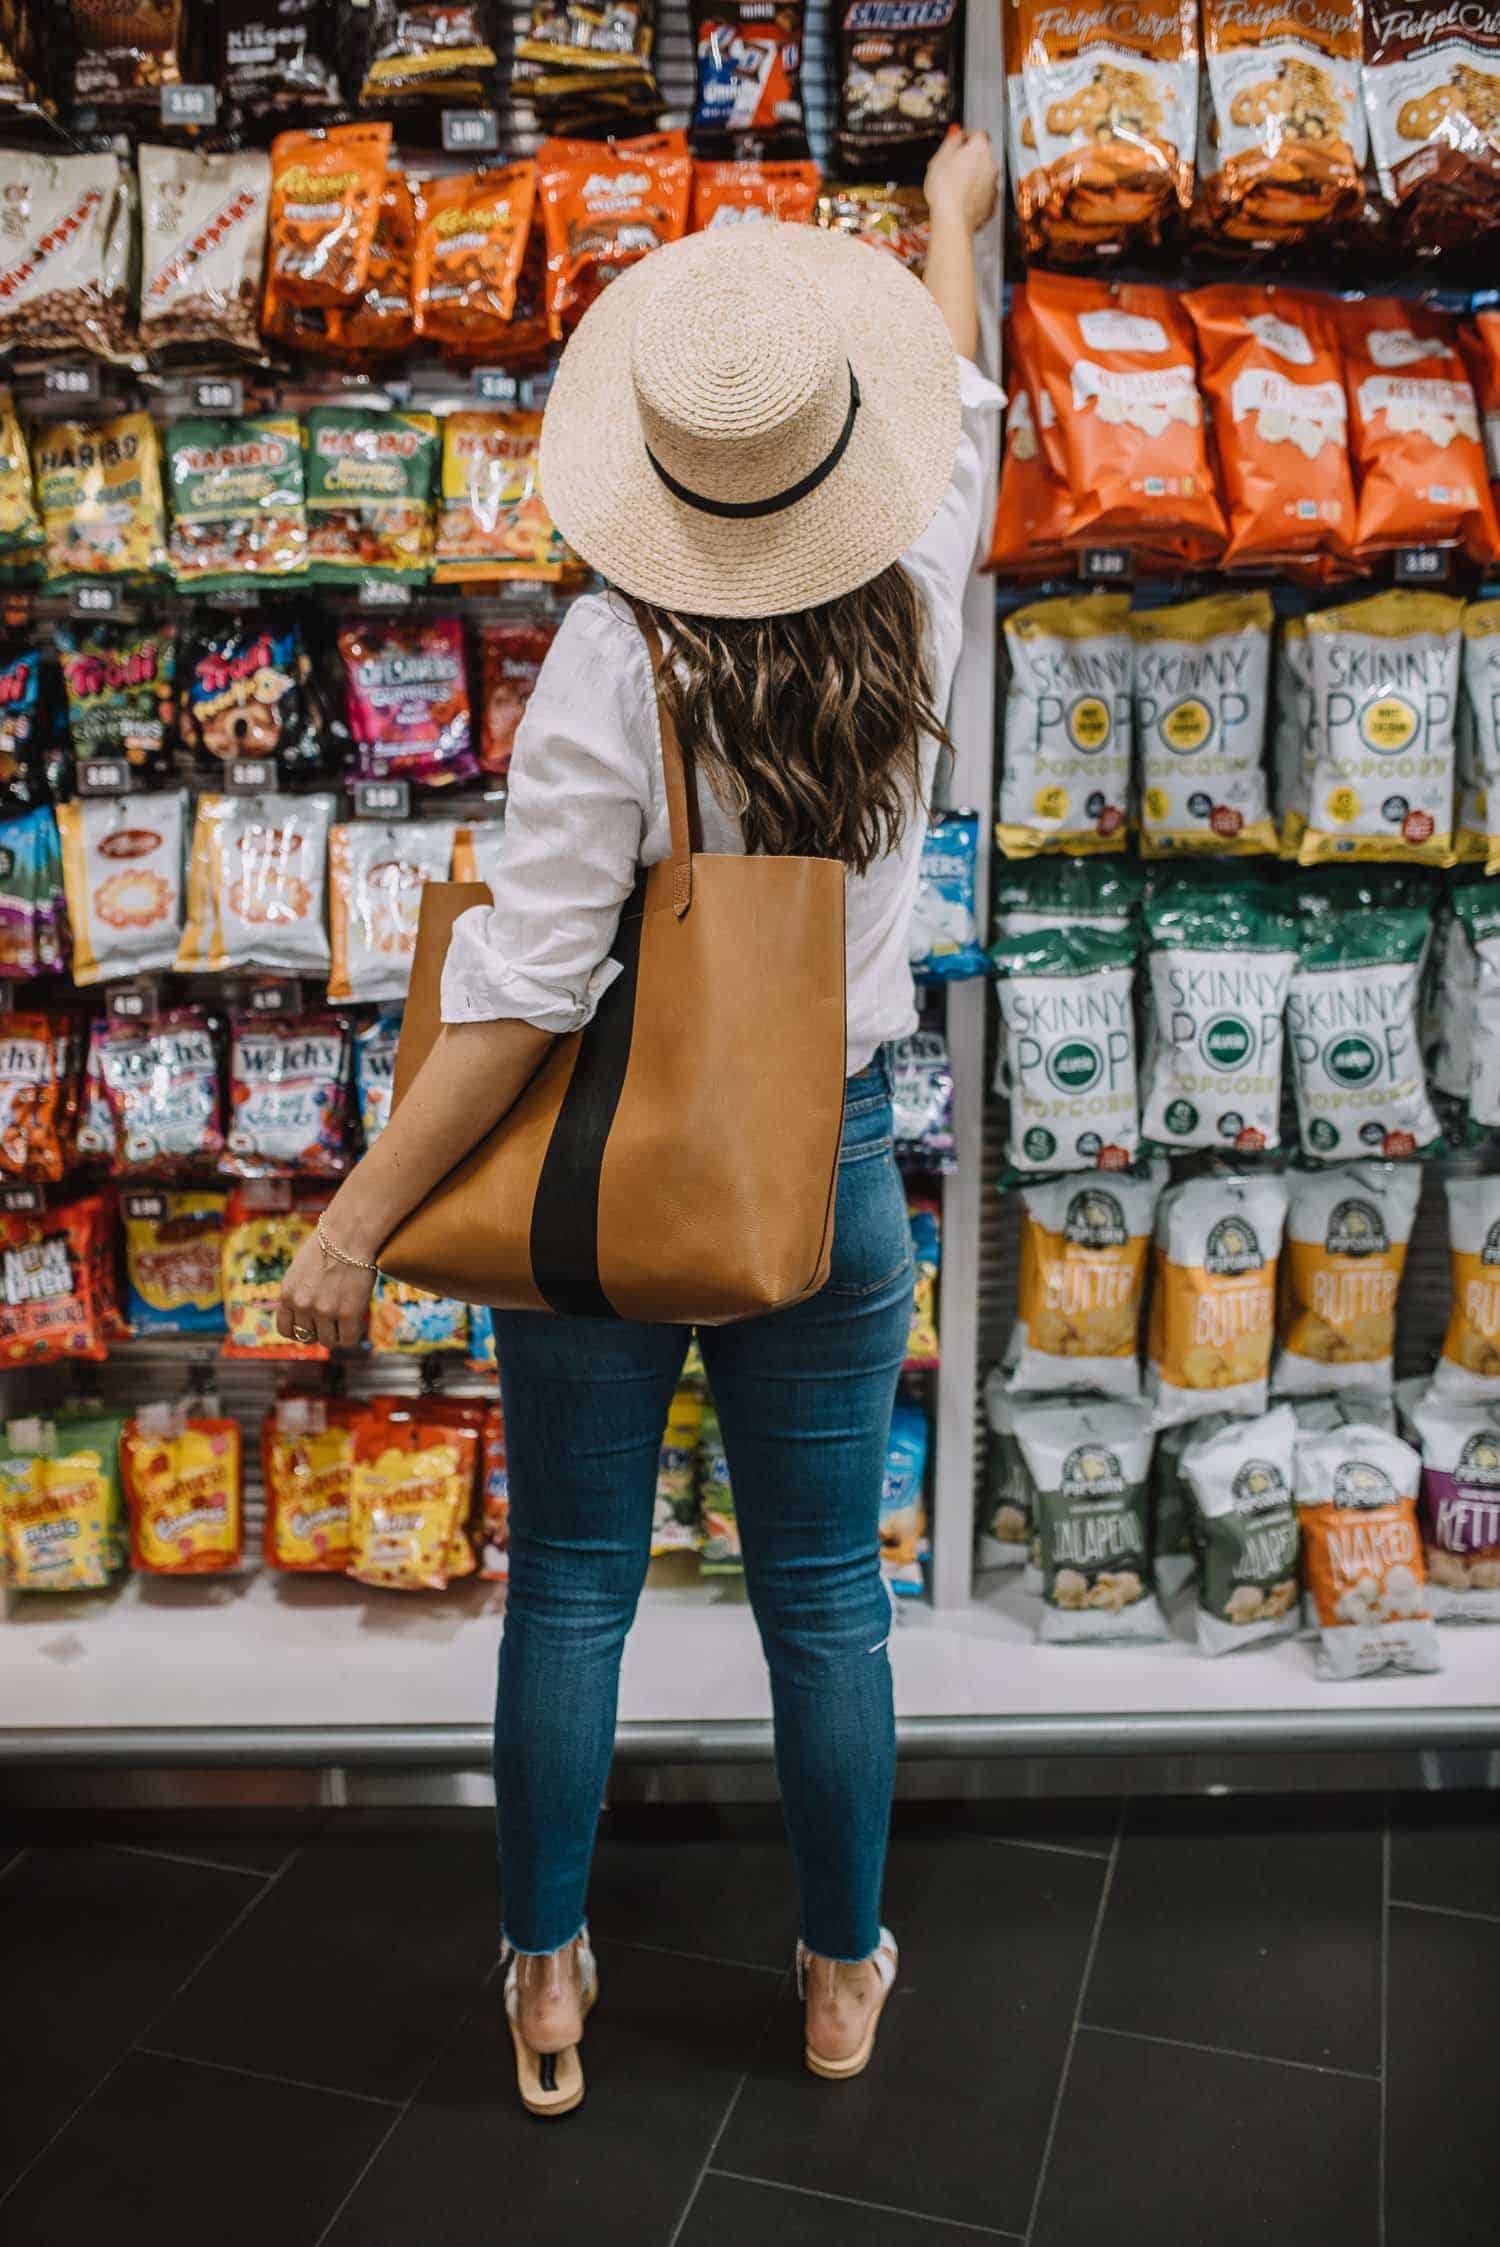 Airport Snack Ideas by Jessica Camerata